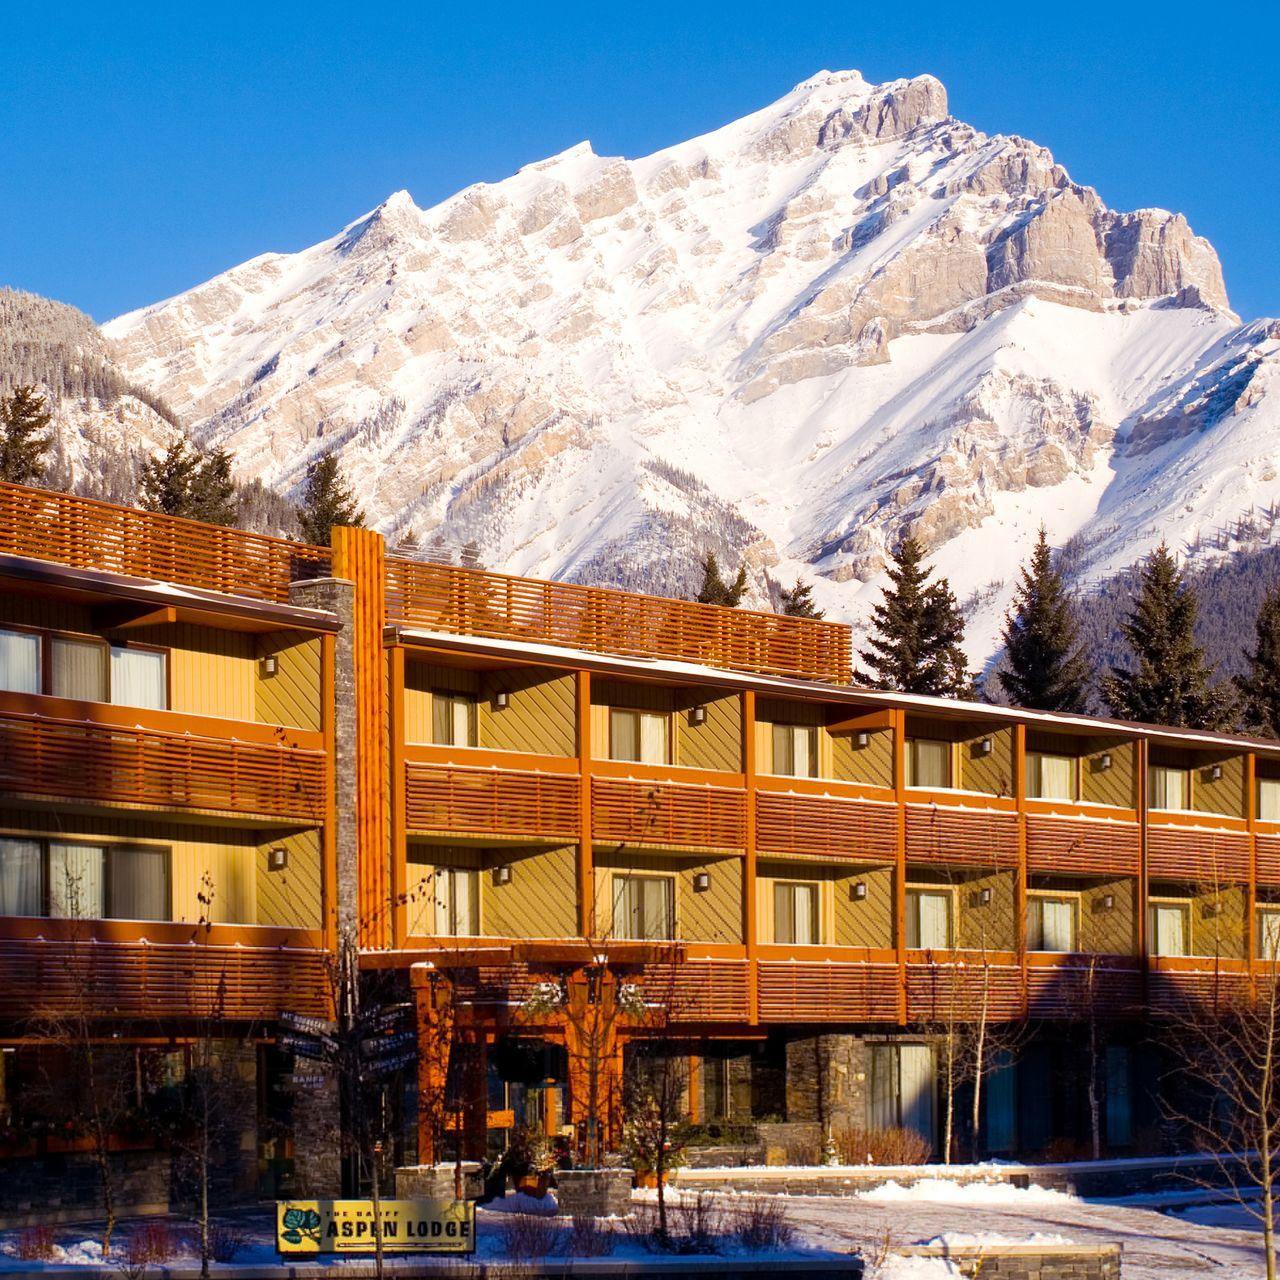 Hotel Alberta Banff Aspen Lodge Canusa